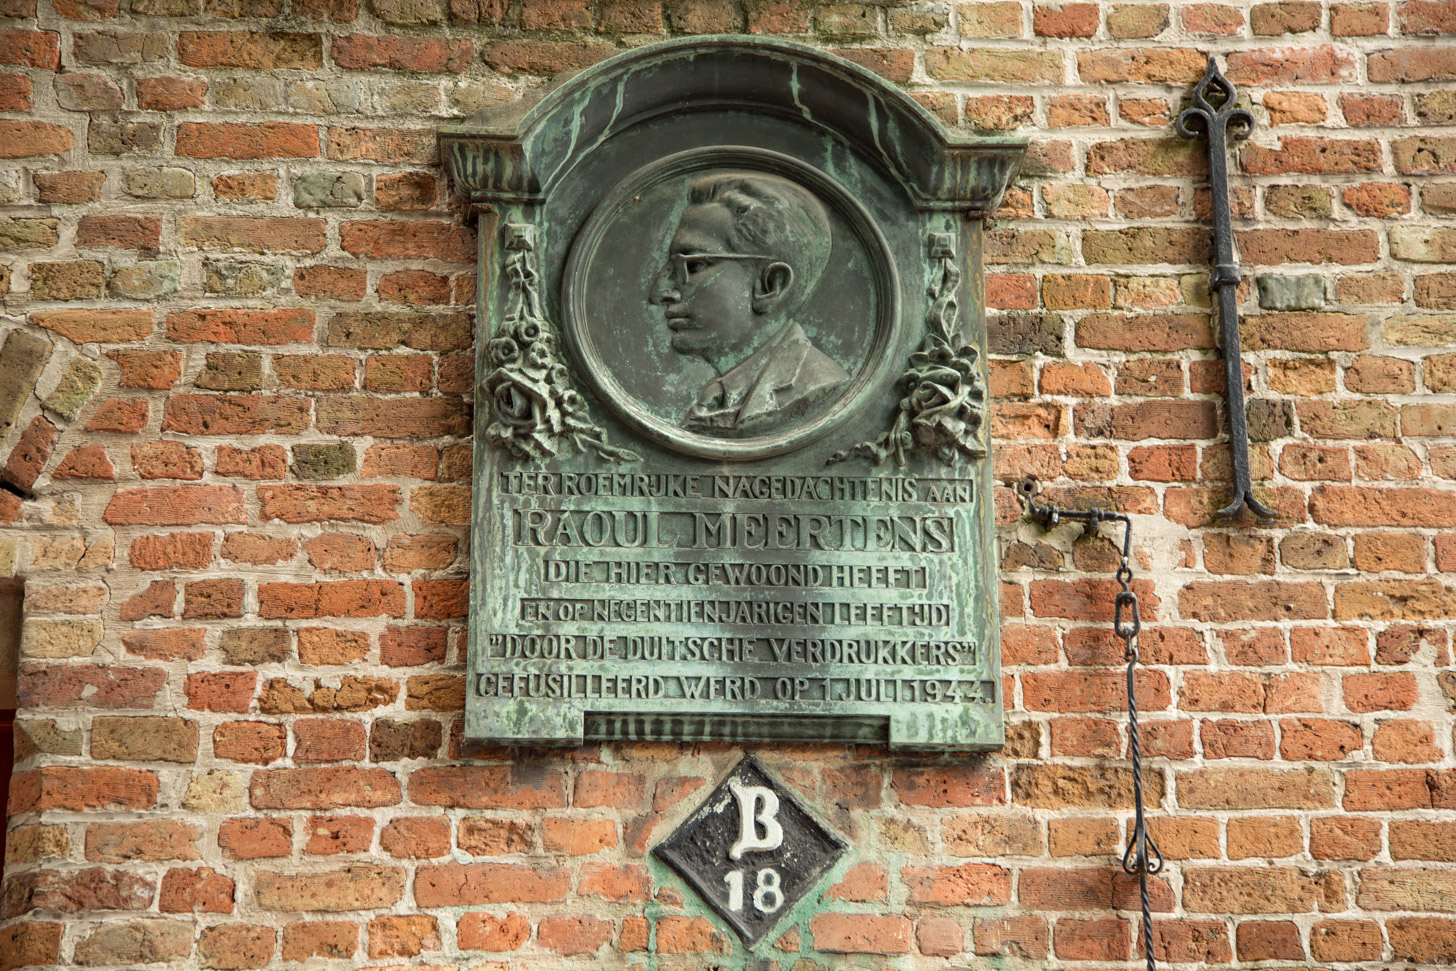 Tweede Wereldoorlog in Brugge